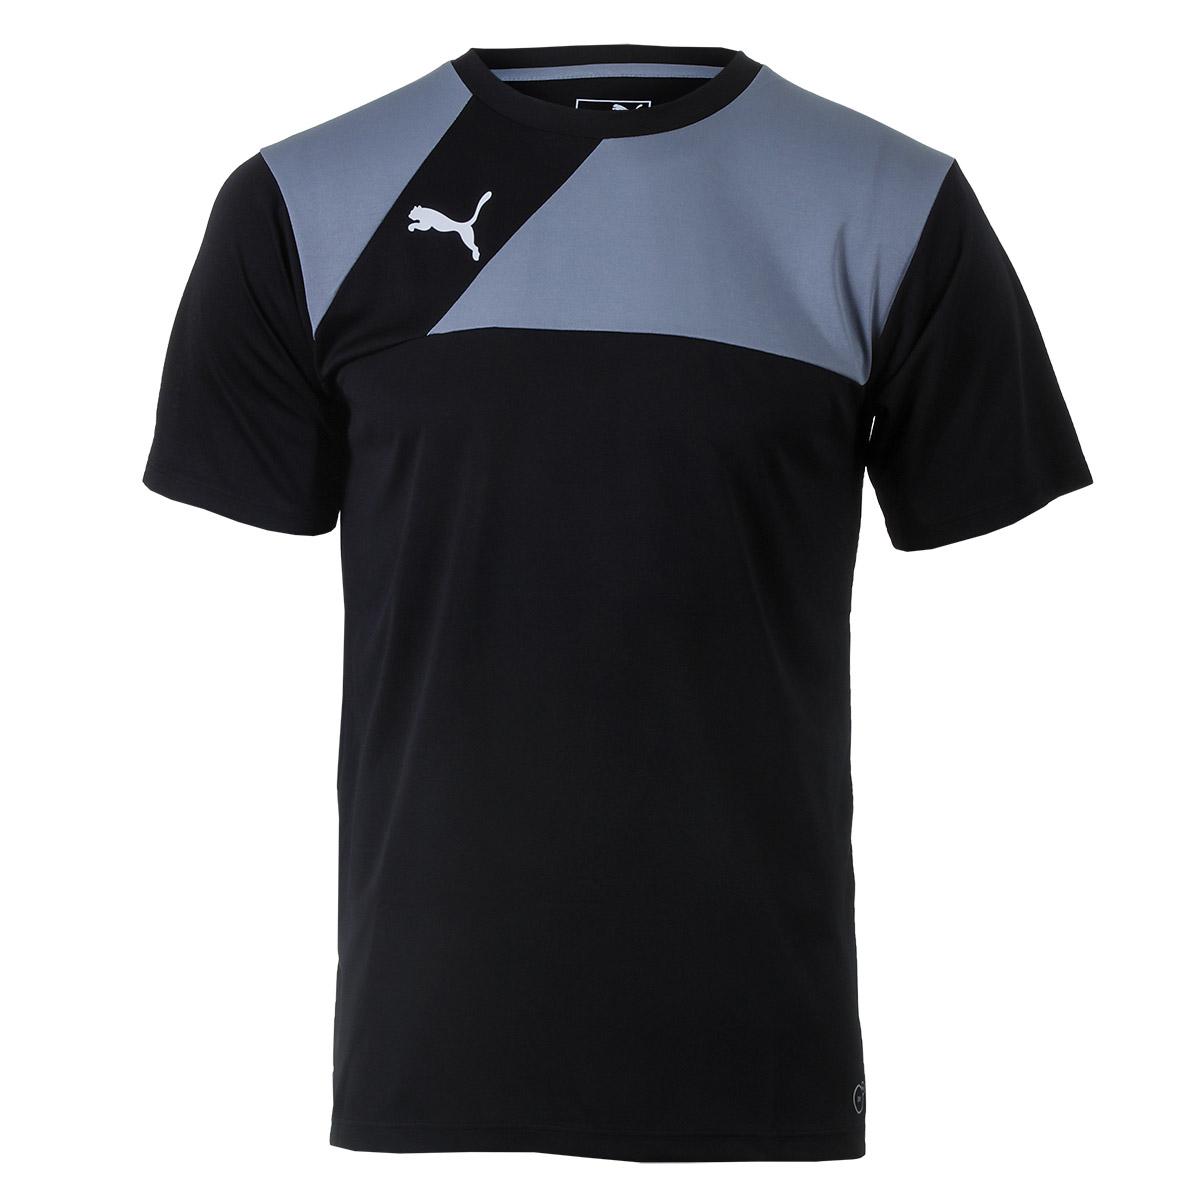 Camiseta Masc. Puma Training Jersey - Preto/Cinza